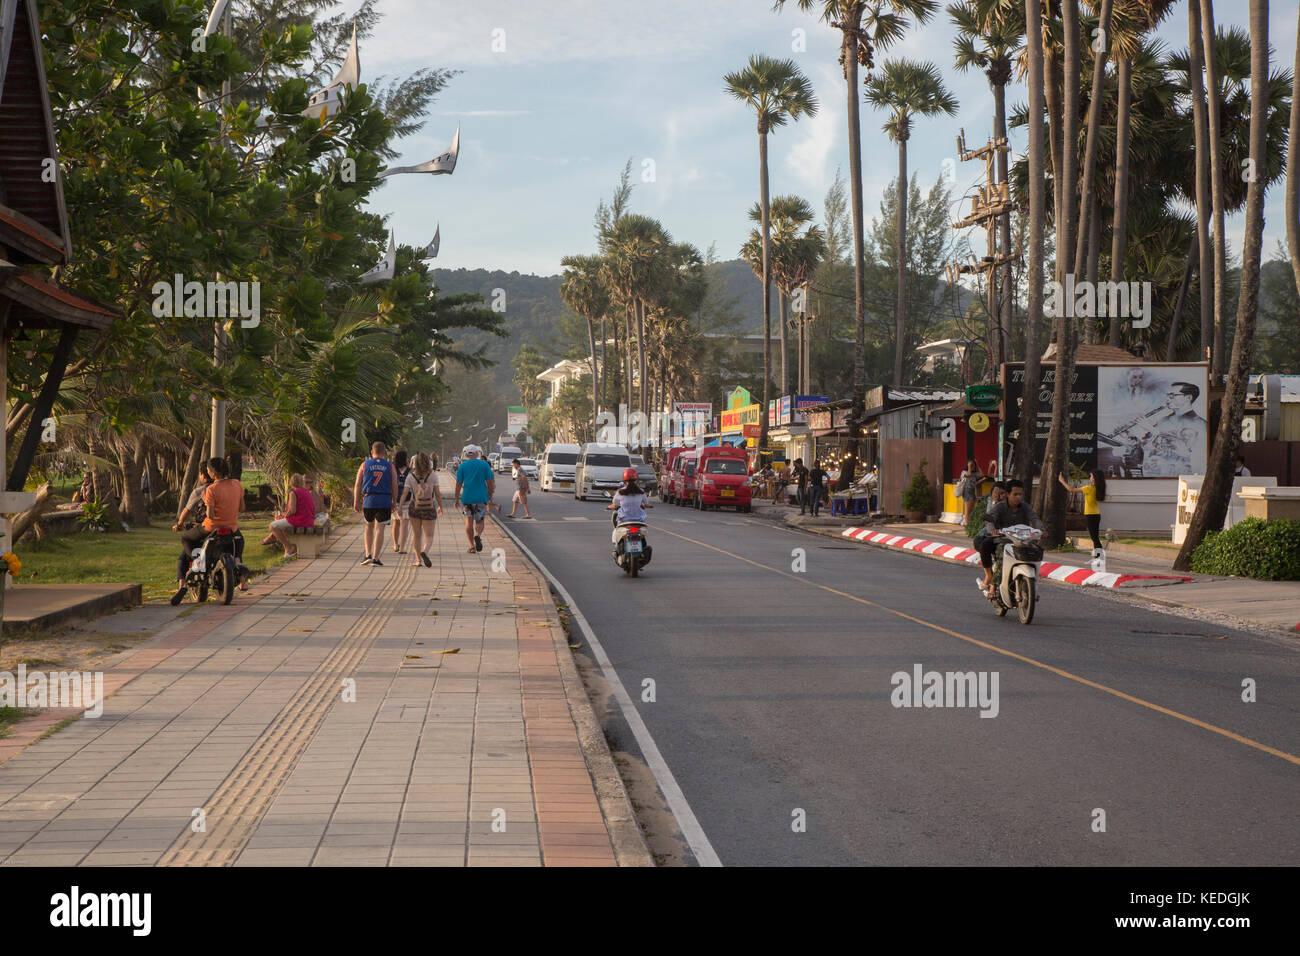 Karon Beach road, Phuket Island - Stock Image